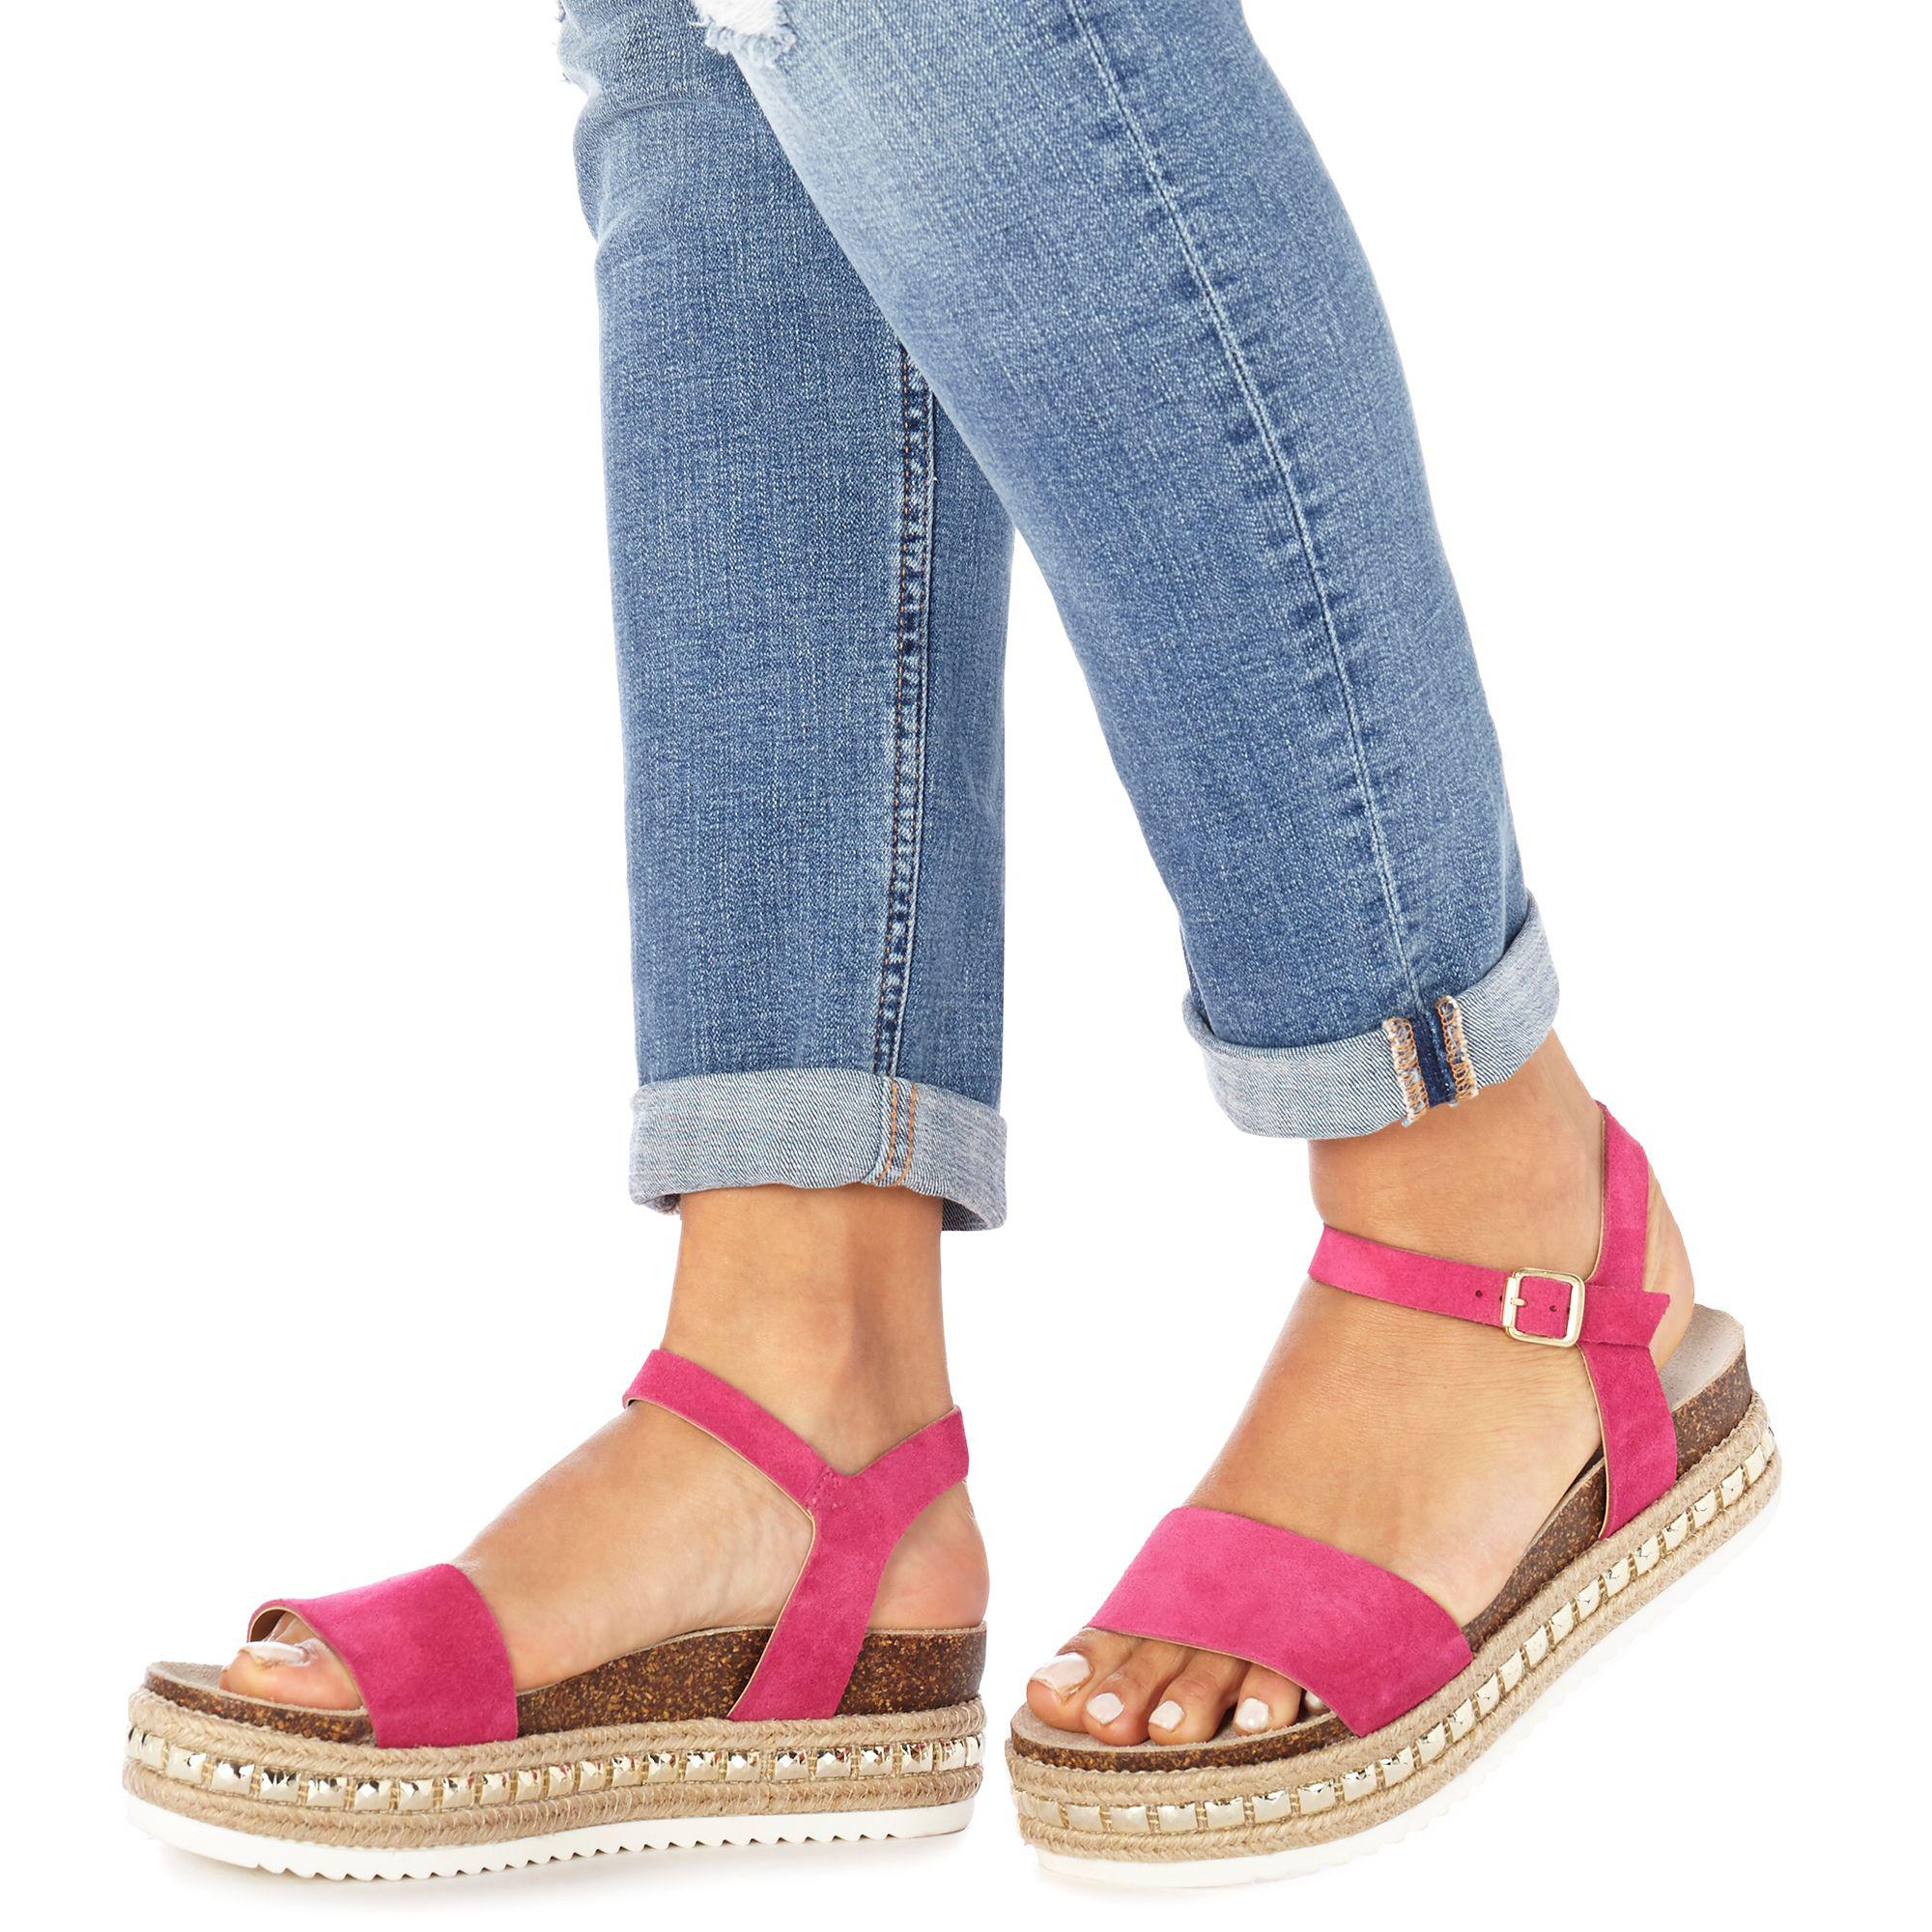 3f5c85b95be Faith Pink Suede  jossy  Mid Flatform Heel Ankle Strap Espadrille ...